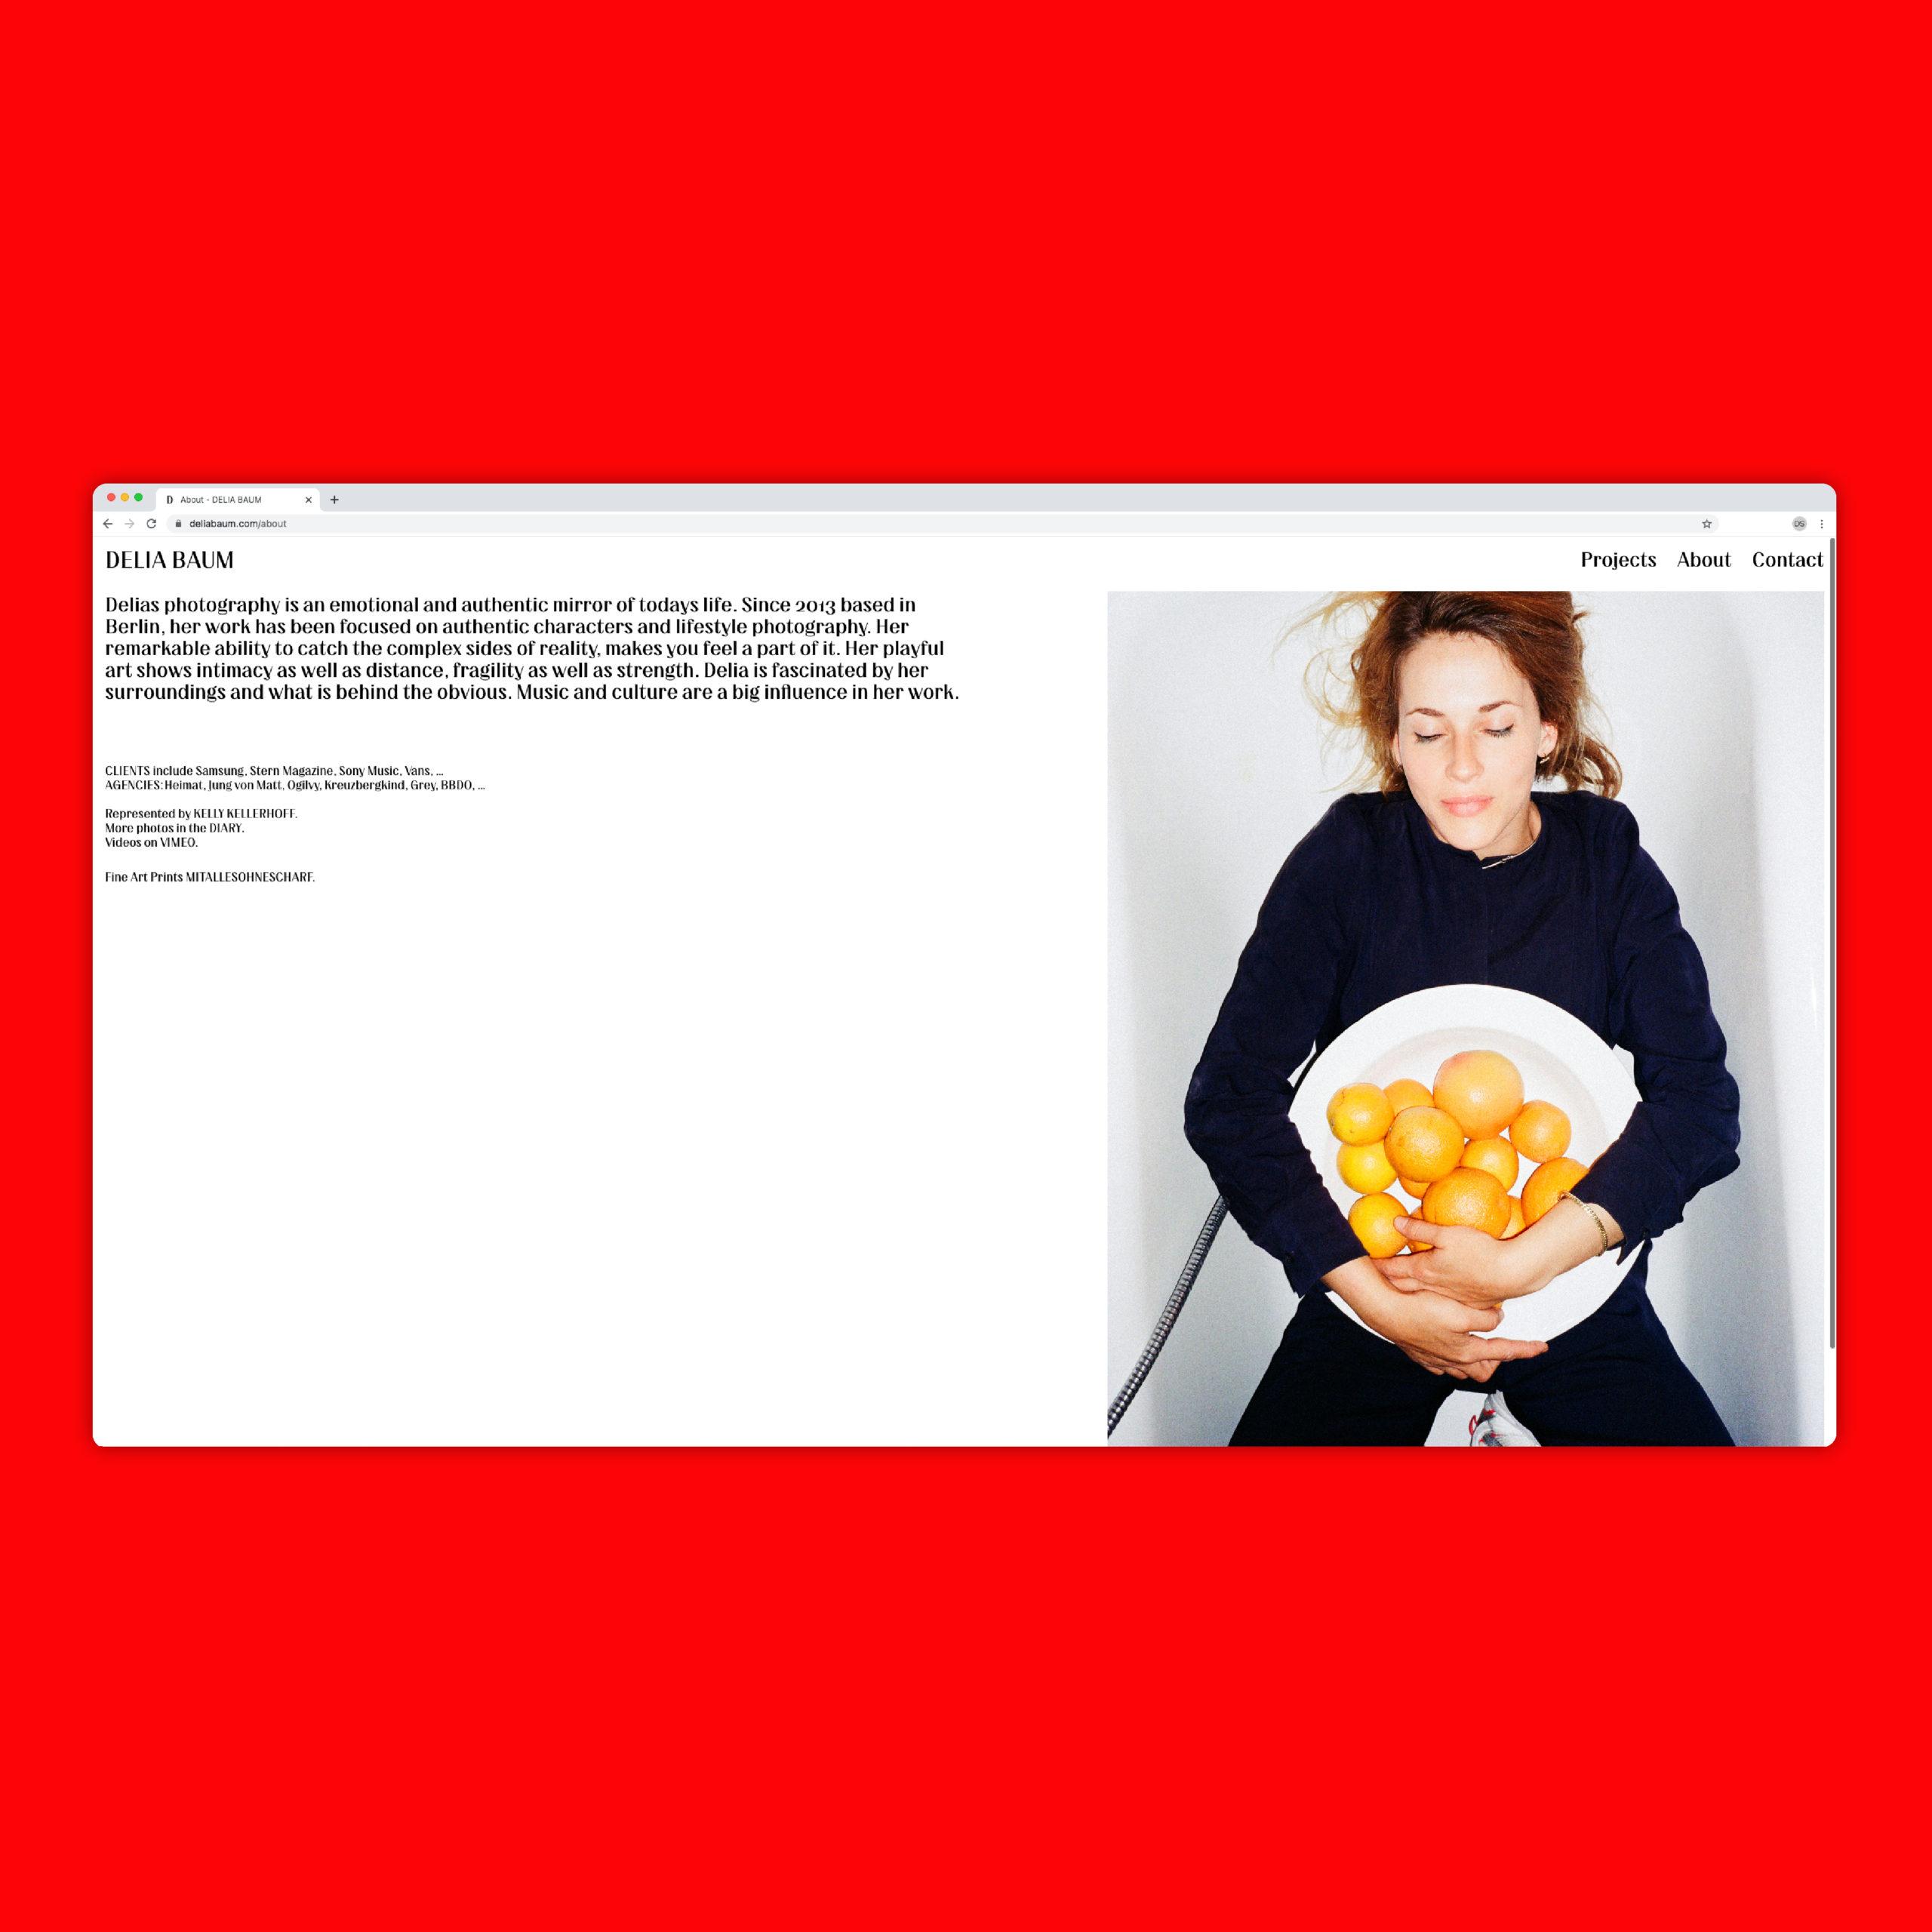 04_Delia-Baum_CI_Daniel-Stuhlpfarrer_Website_7